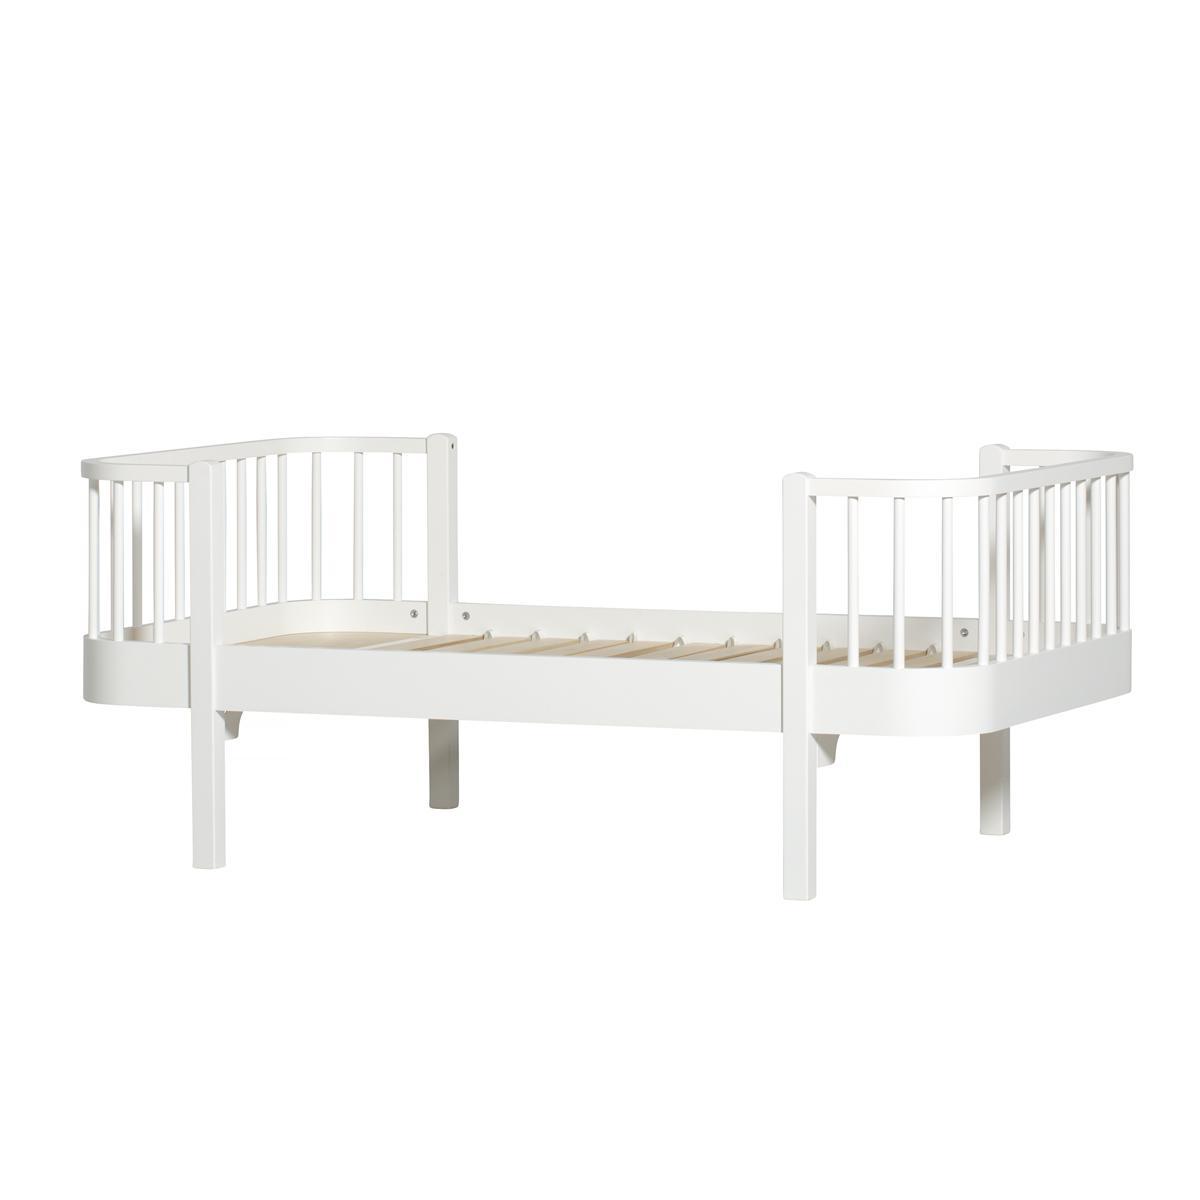 Cama individual evolutiva 90x160cm WOOD Oliver Furniture blanco